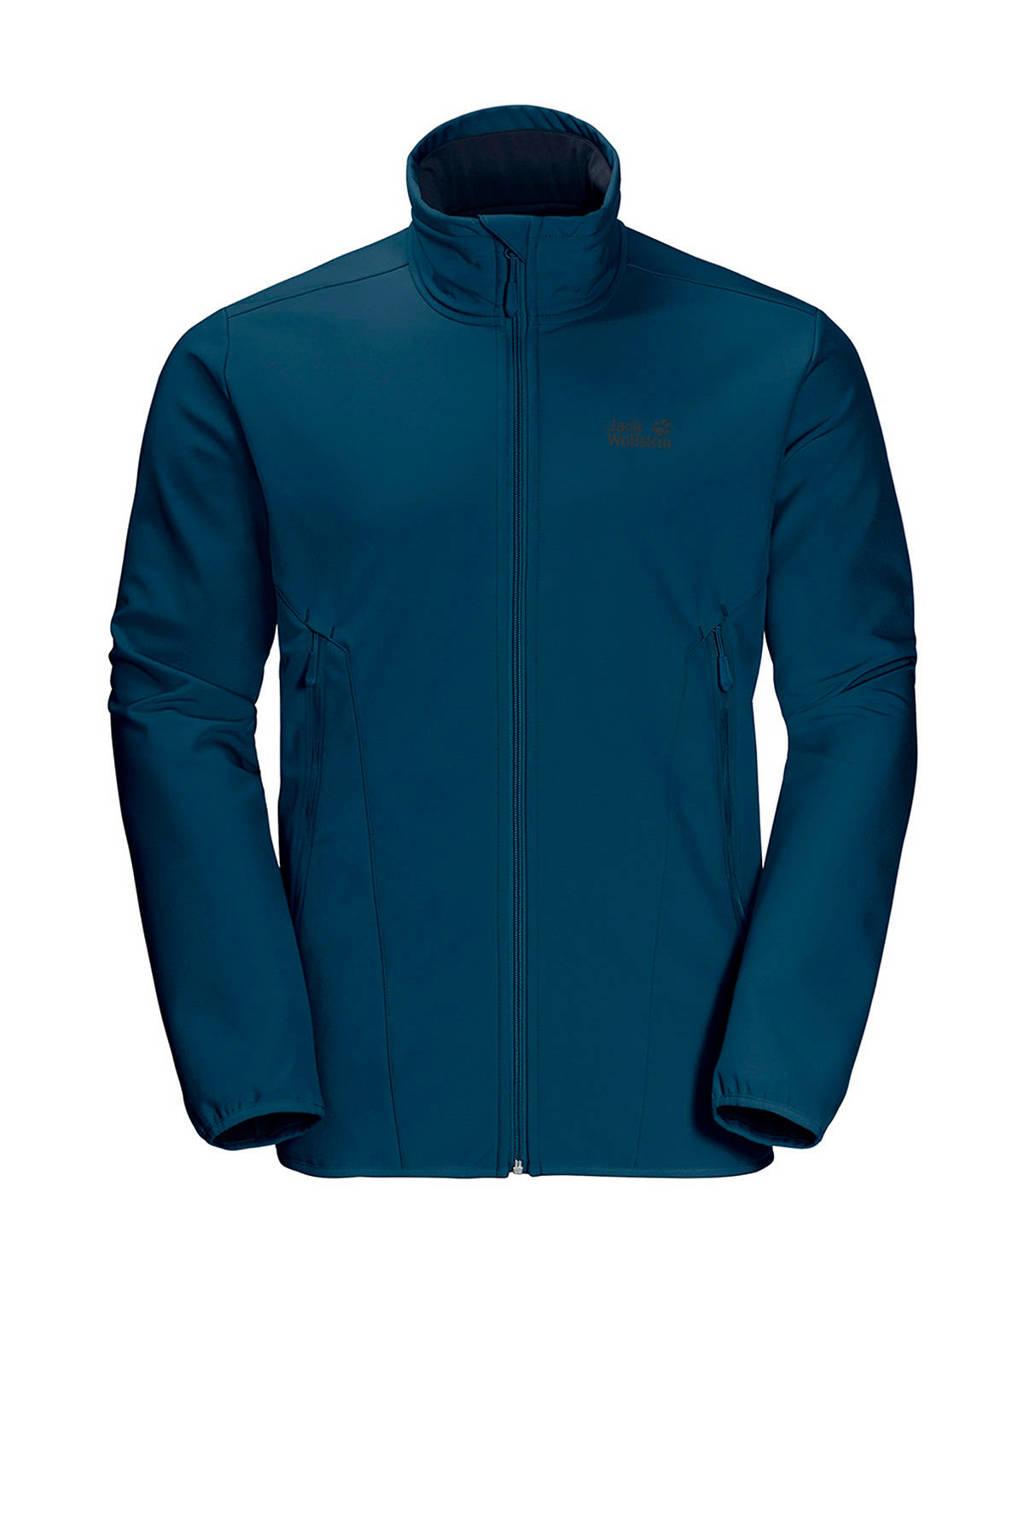 Jack Wolfskin softshell jas Northern Pass blauw, Poseidon Blue